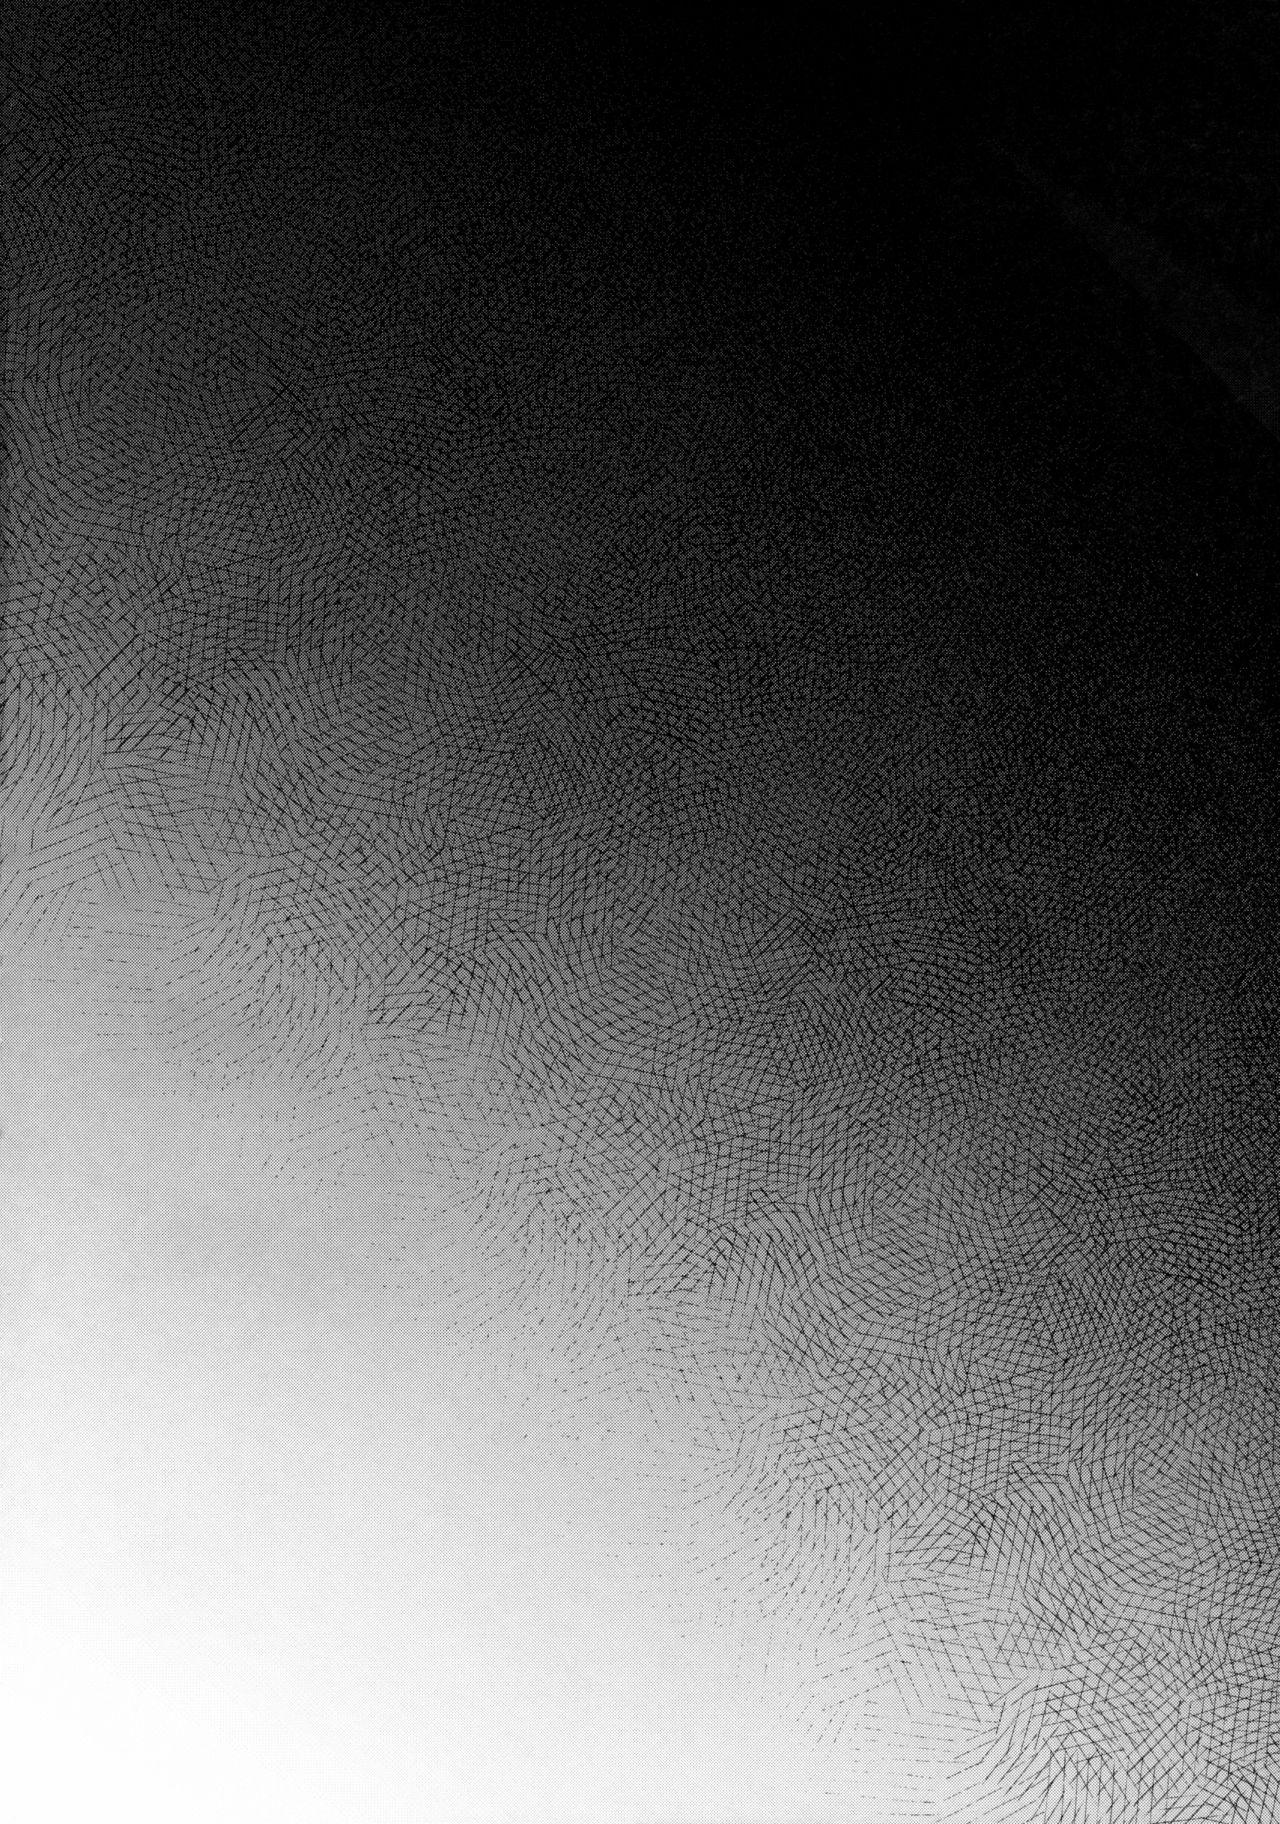 Lolicon to JS ga Futari de Otomari Shitara... | When A Grade Schooler & A Pedo Stay The Night 2